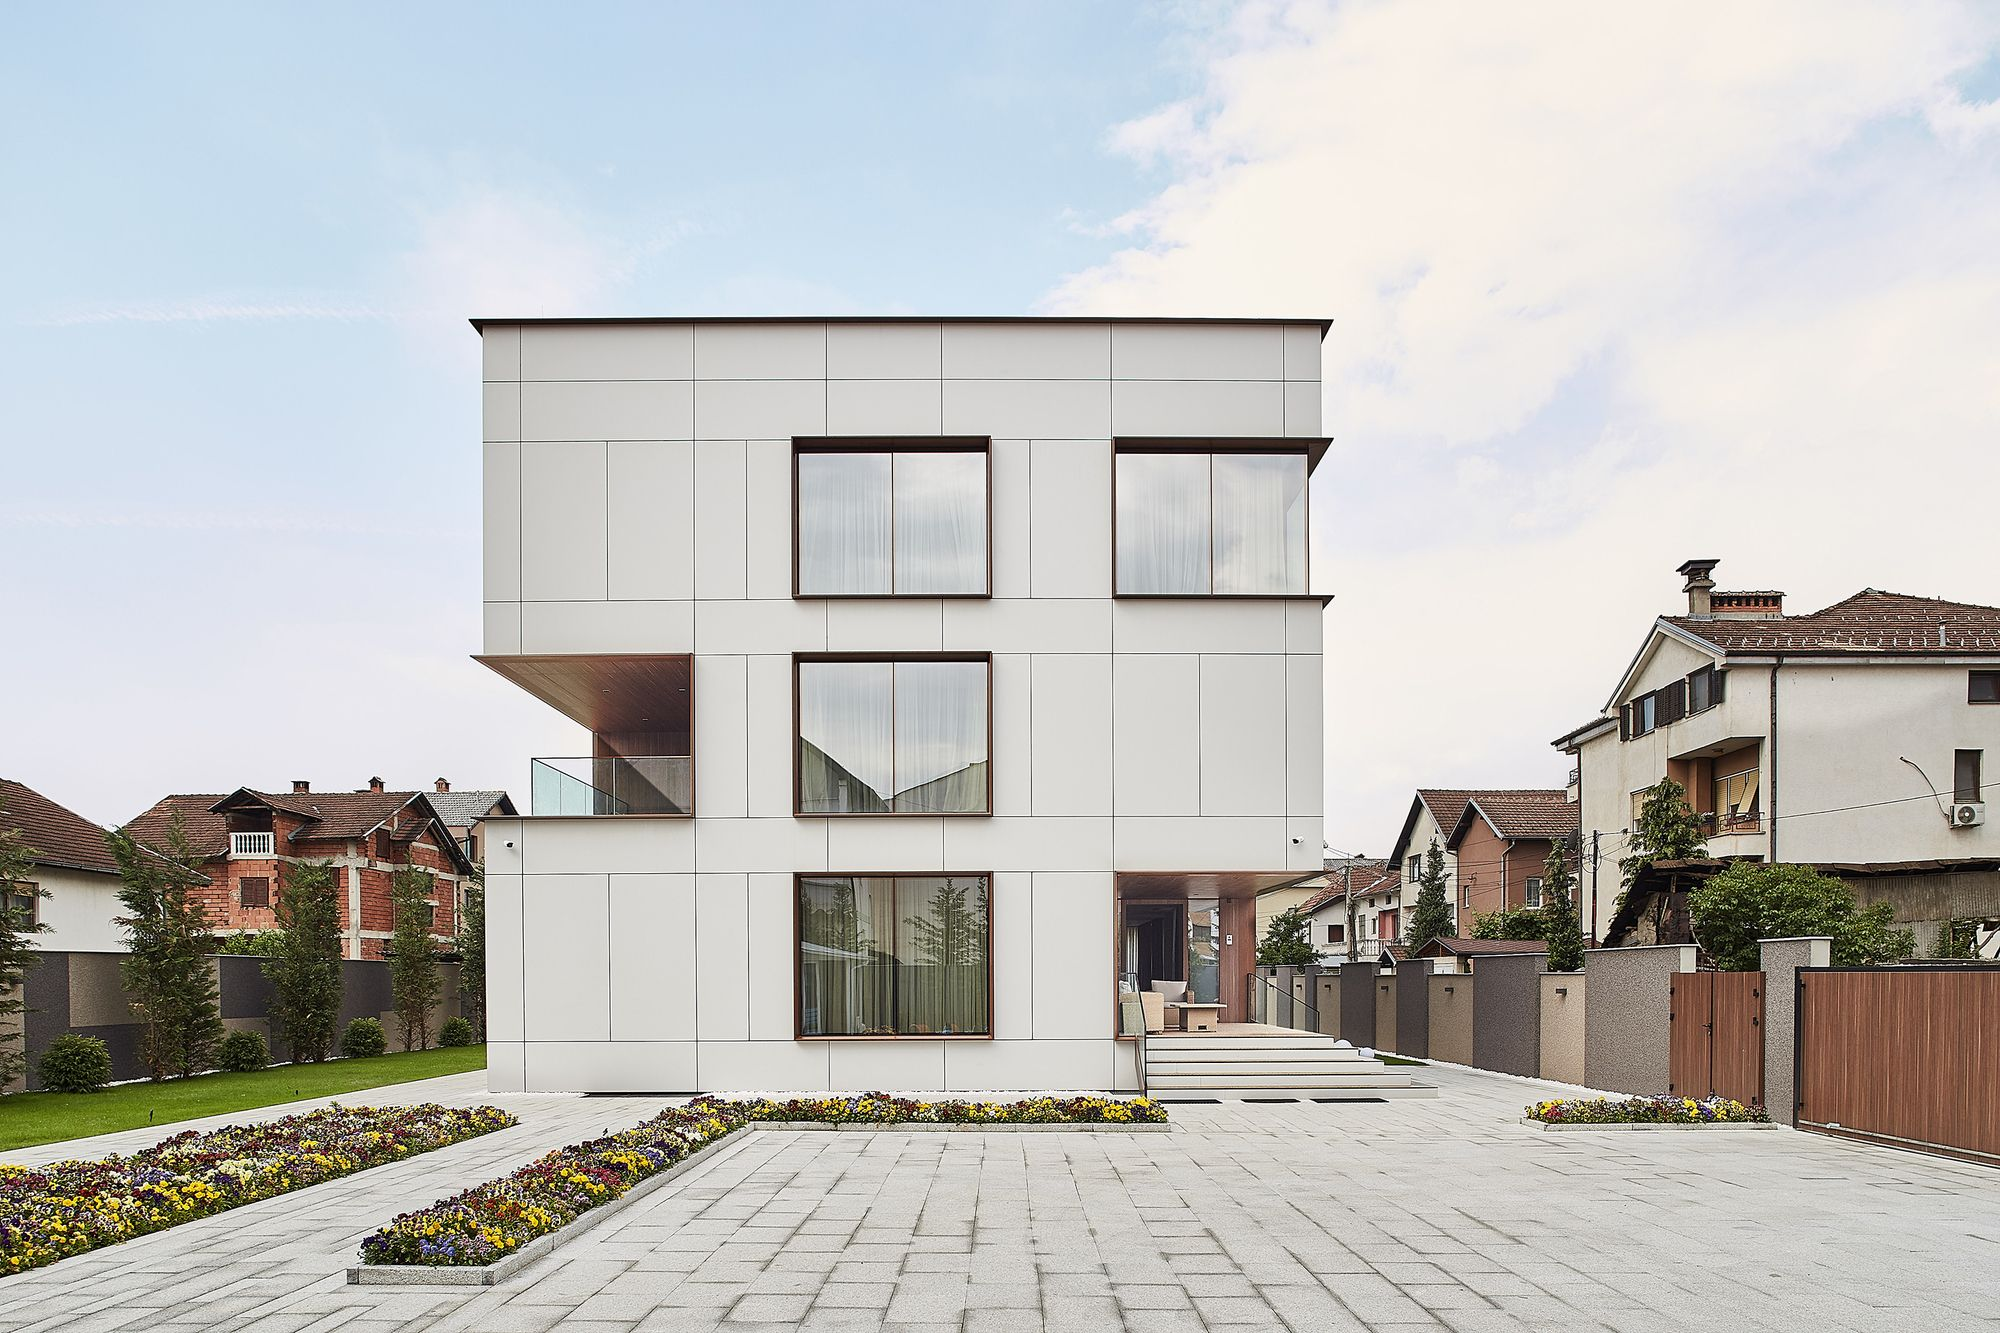 SD Residence BMA Besian Mehmeti Architects